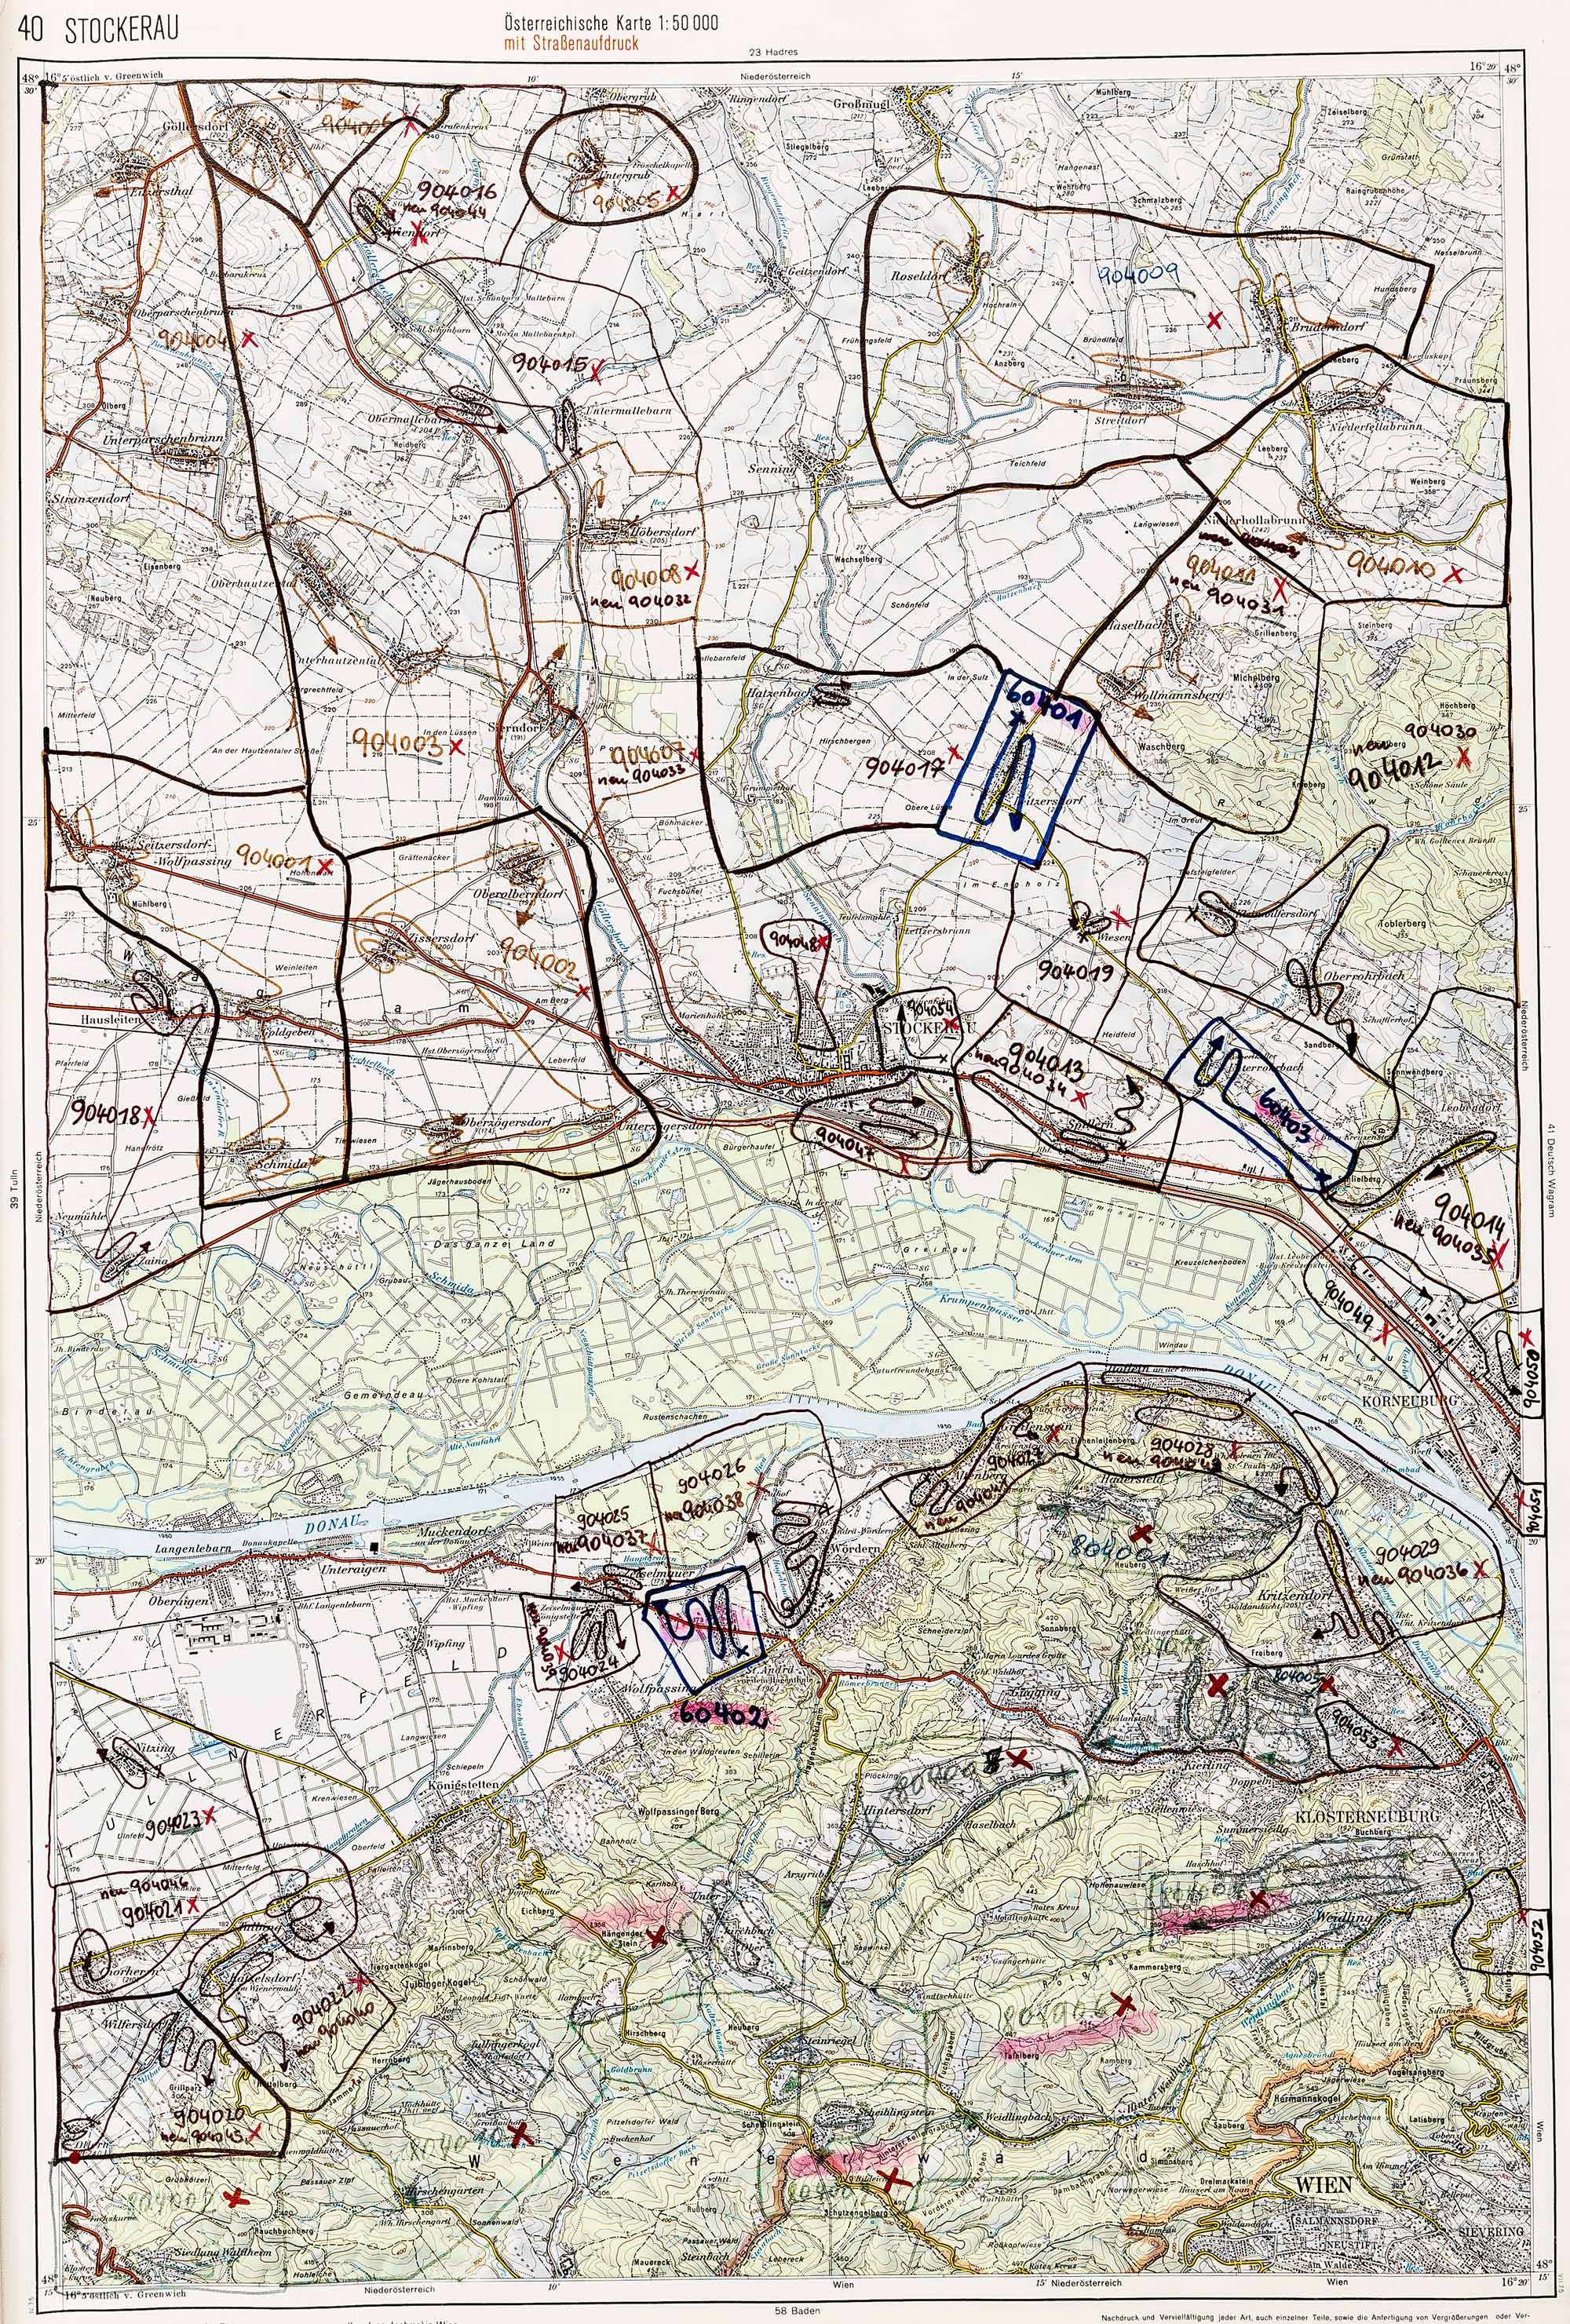 1975-1979 Karte 040